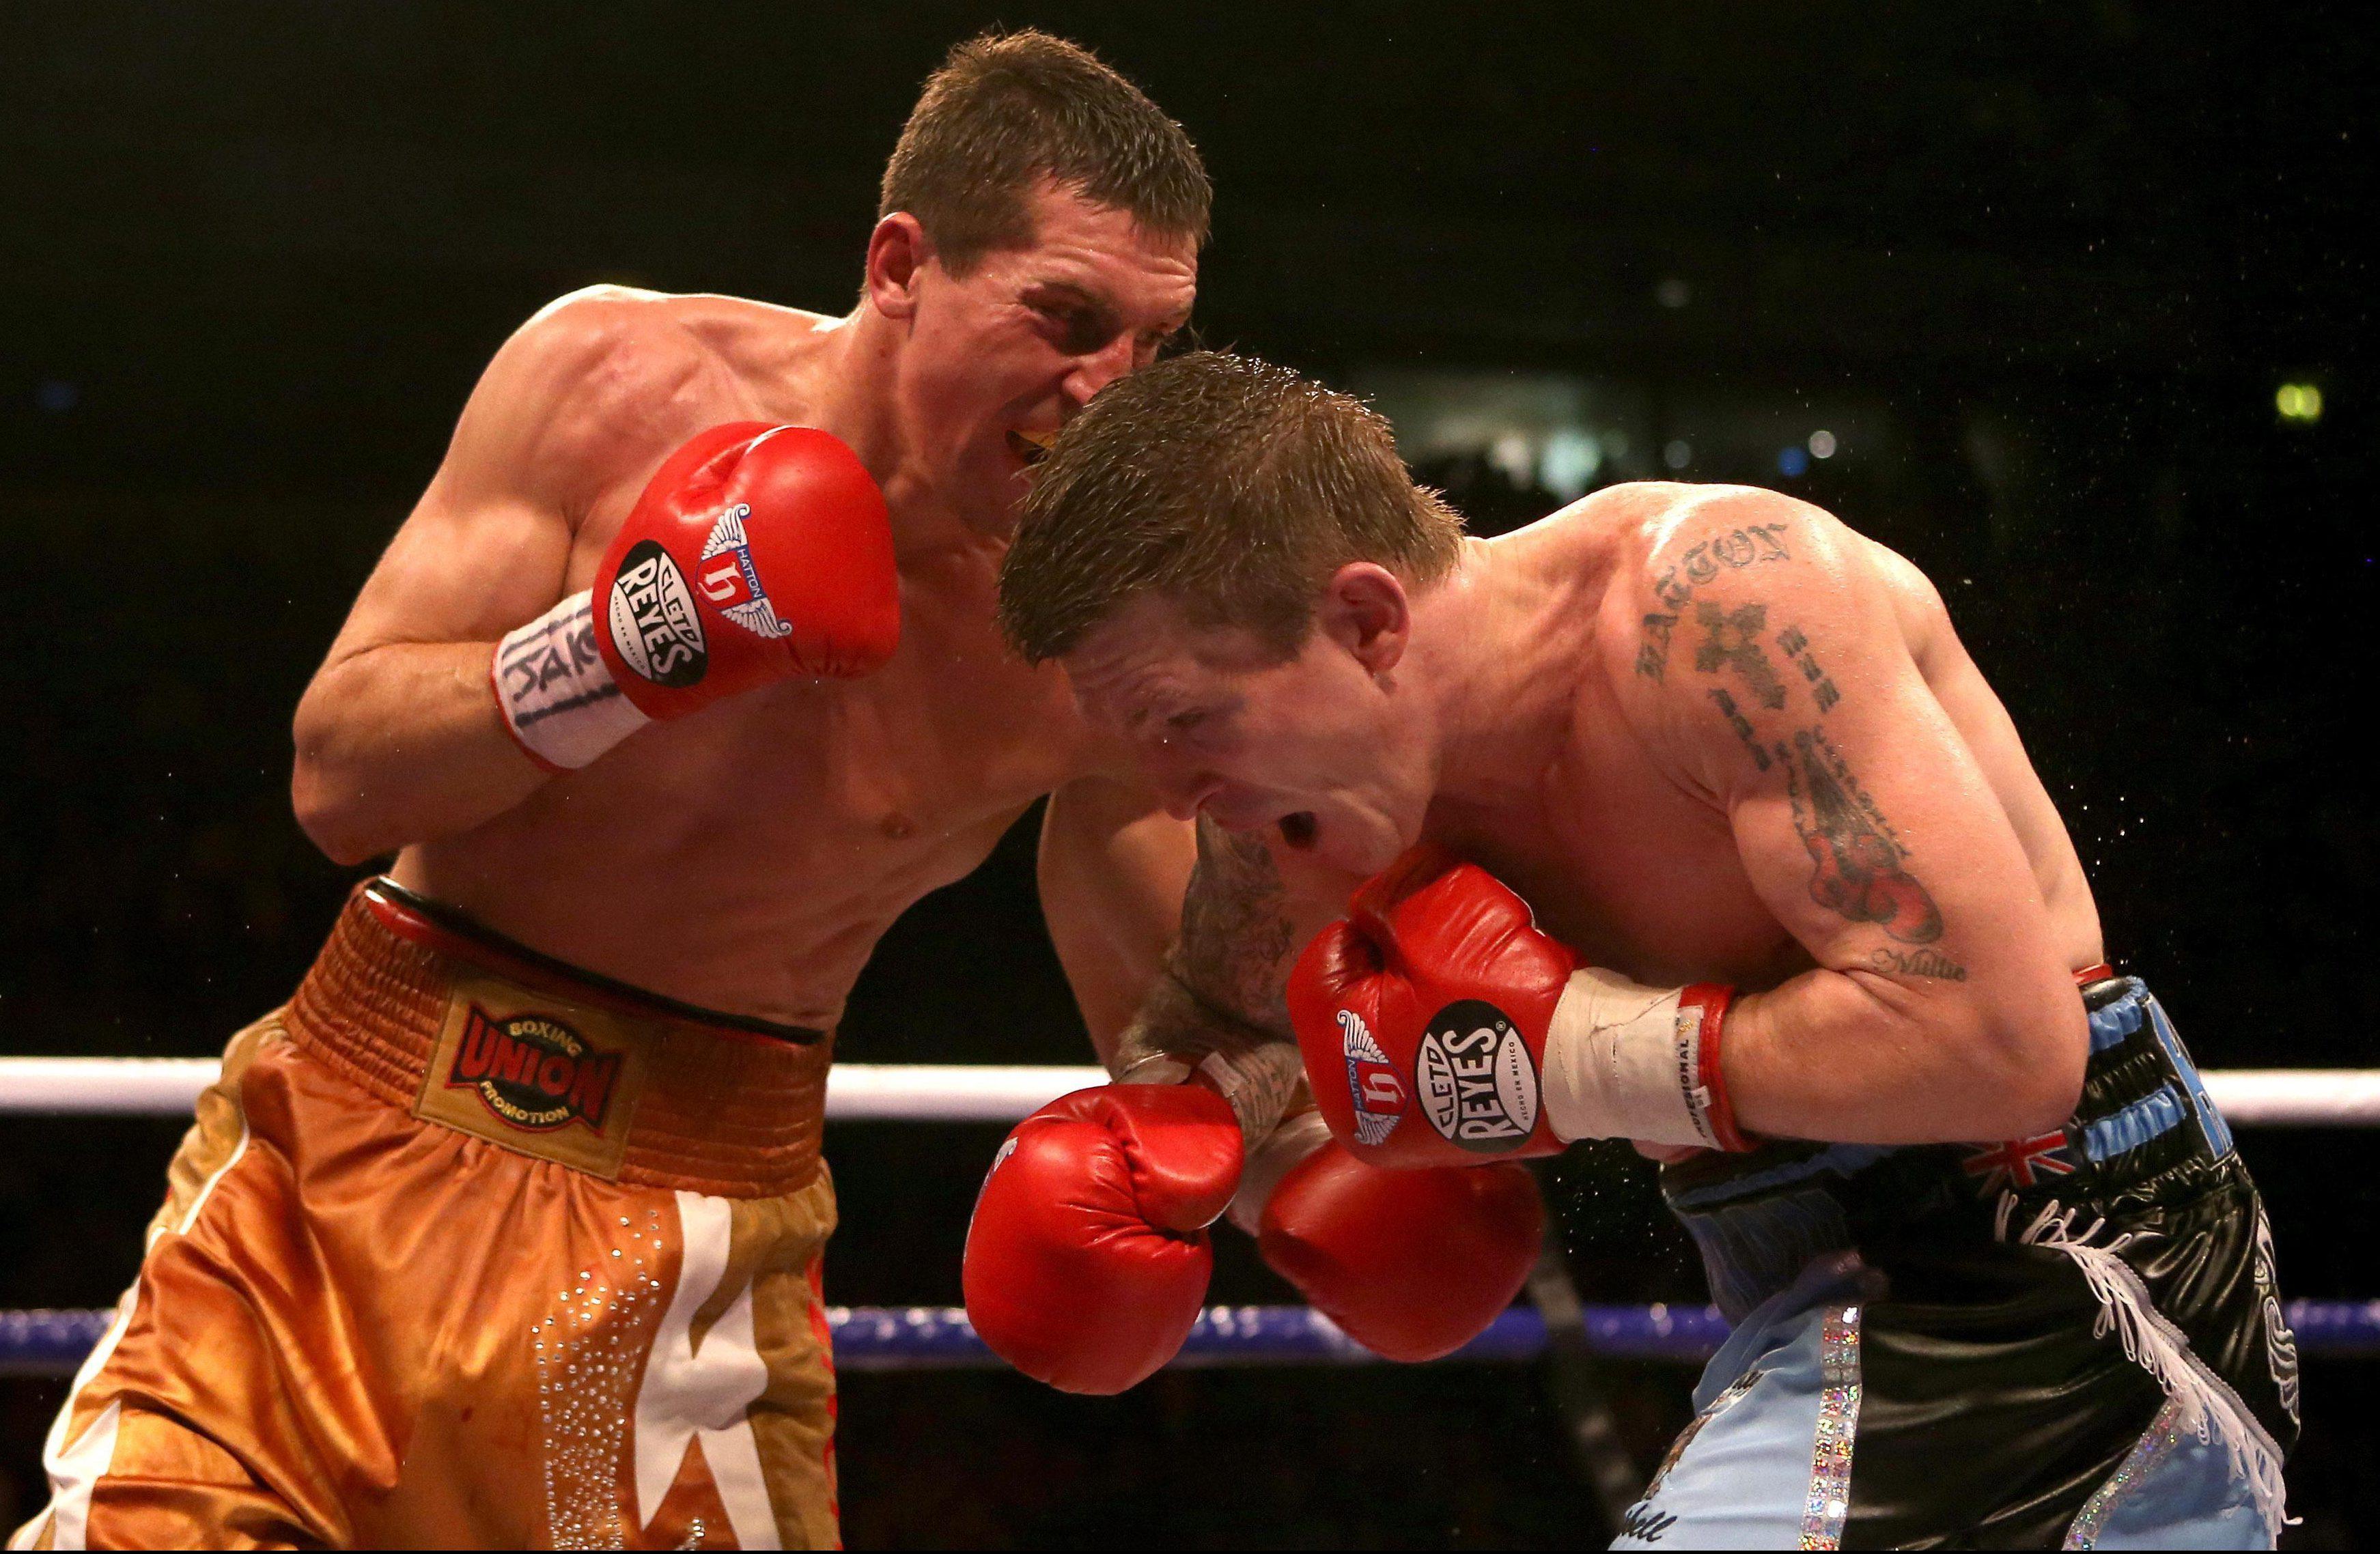 Ricky Hatton made a disastrous comeback against Vyacheslav Senchenko